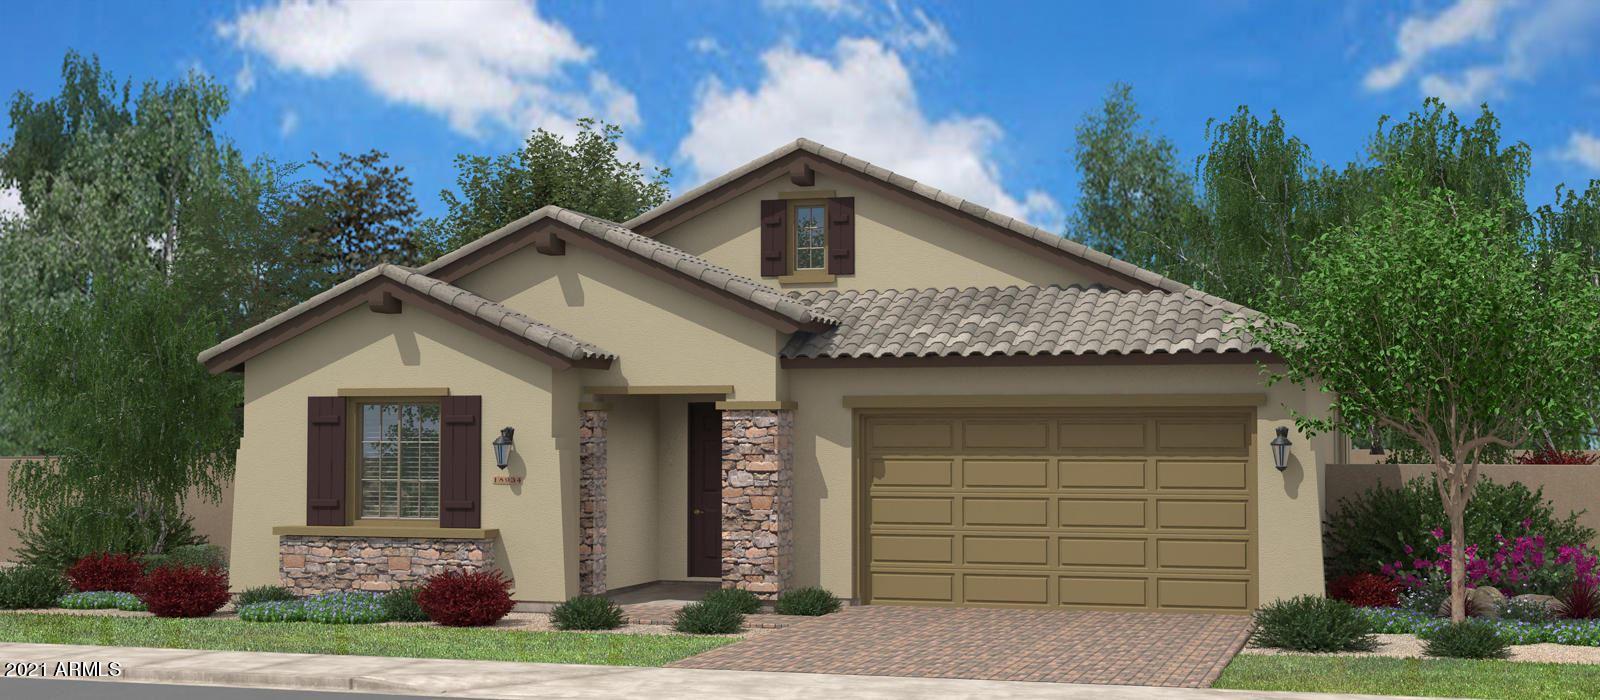 Photo for 41703 W BARCELONA Drive, Maricopa, AZ 85138 (MLS # 6180021)